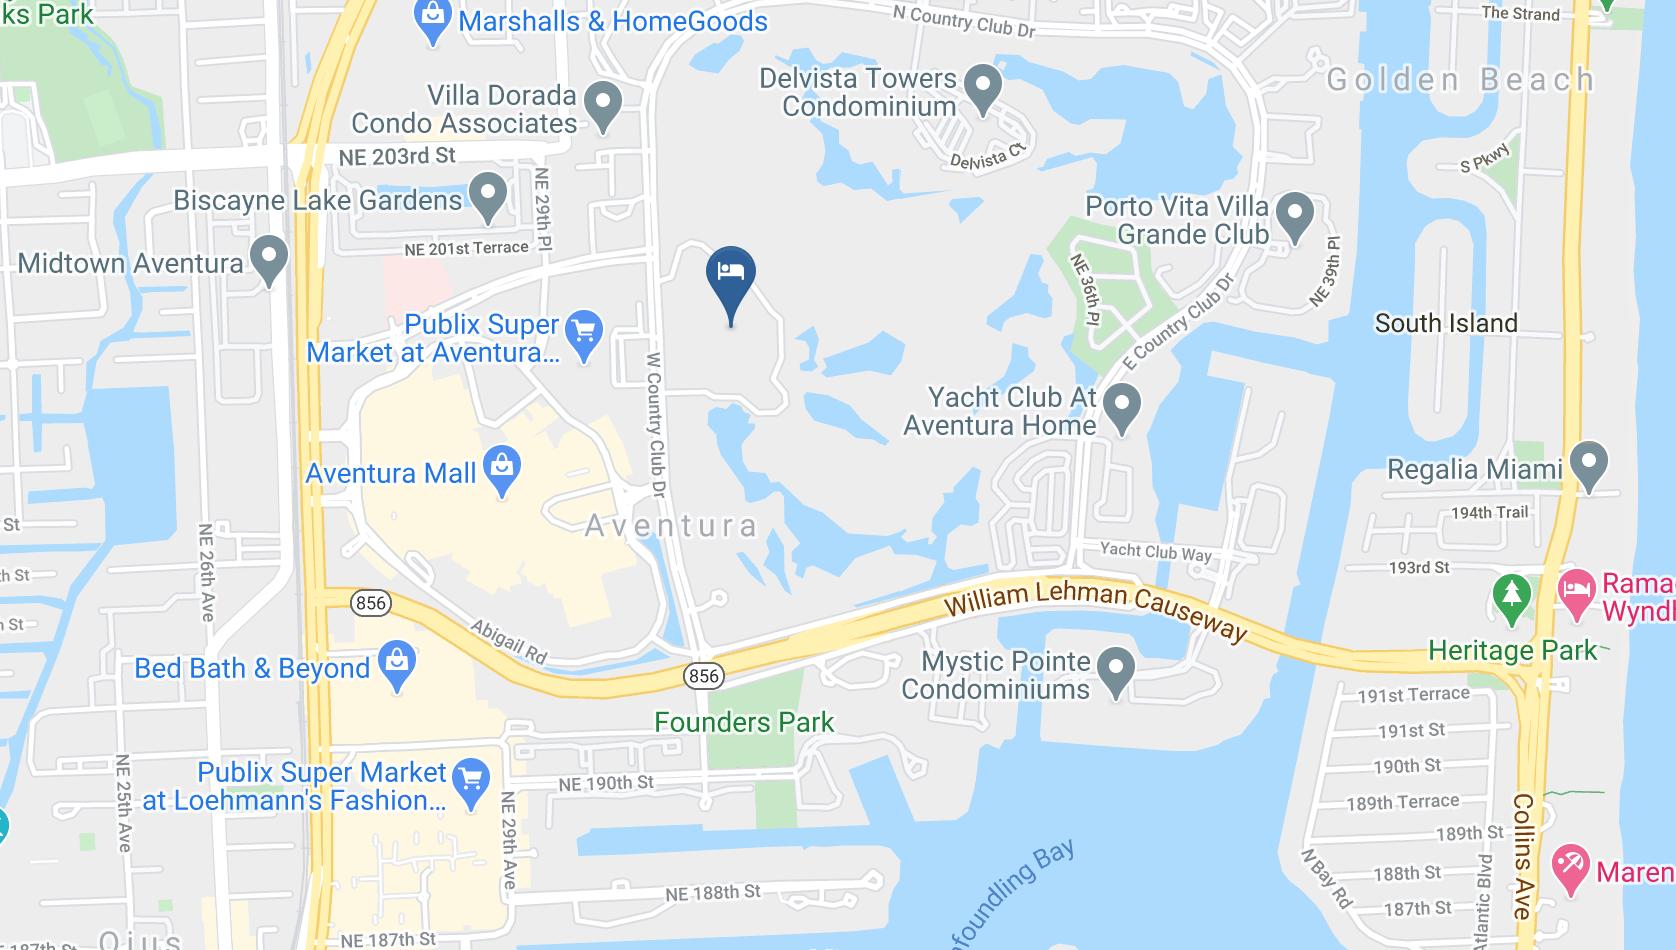 Google Map of JW Marriott Turnberry Isle Miami